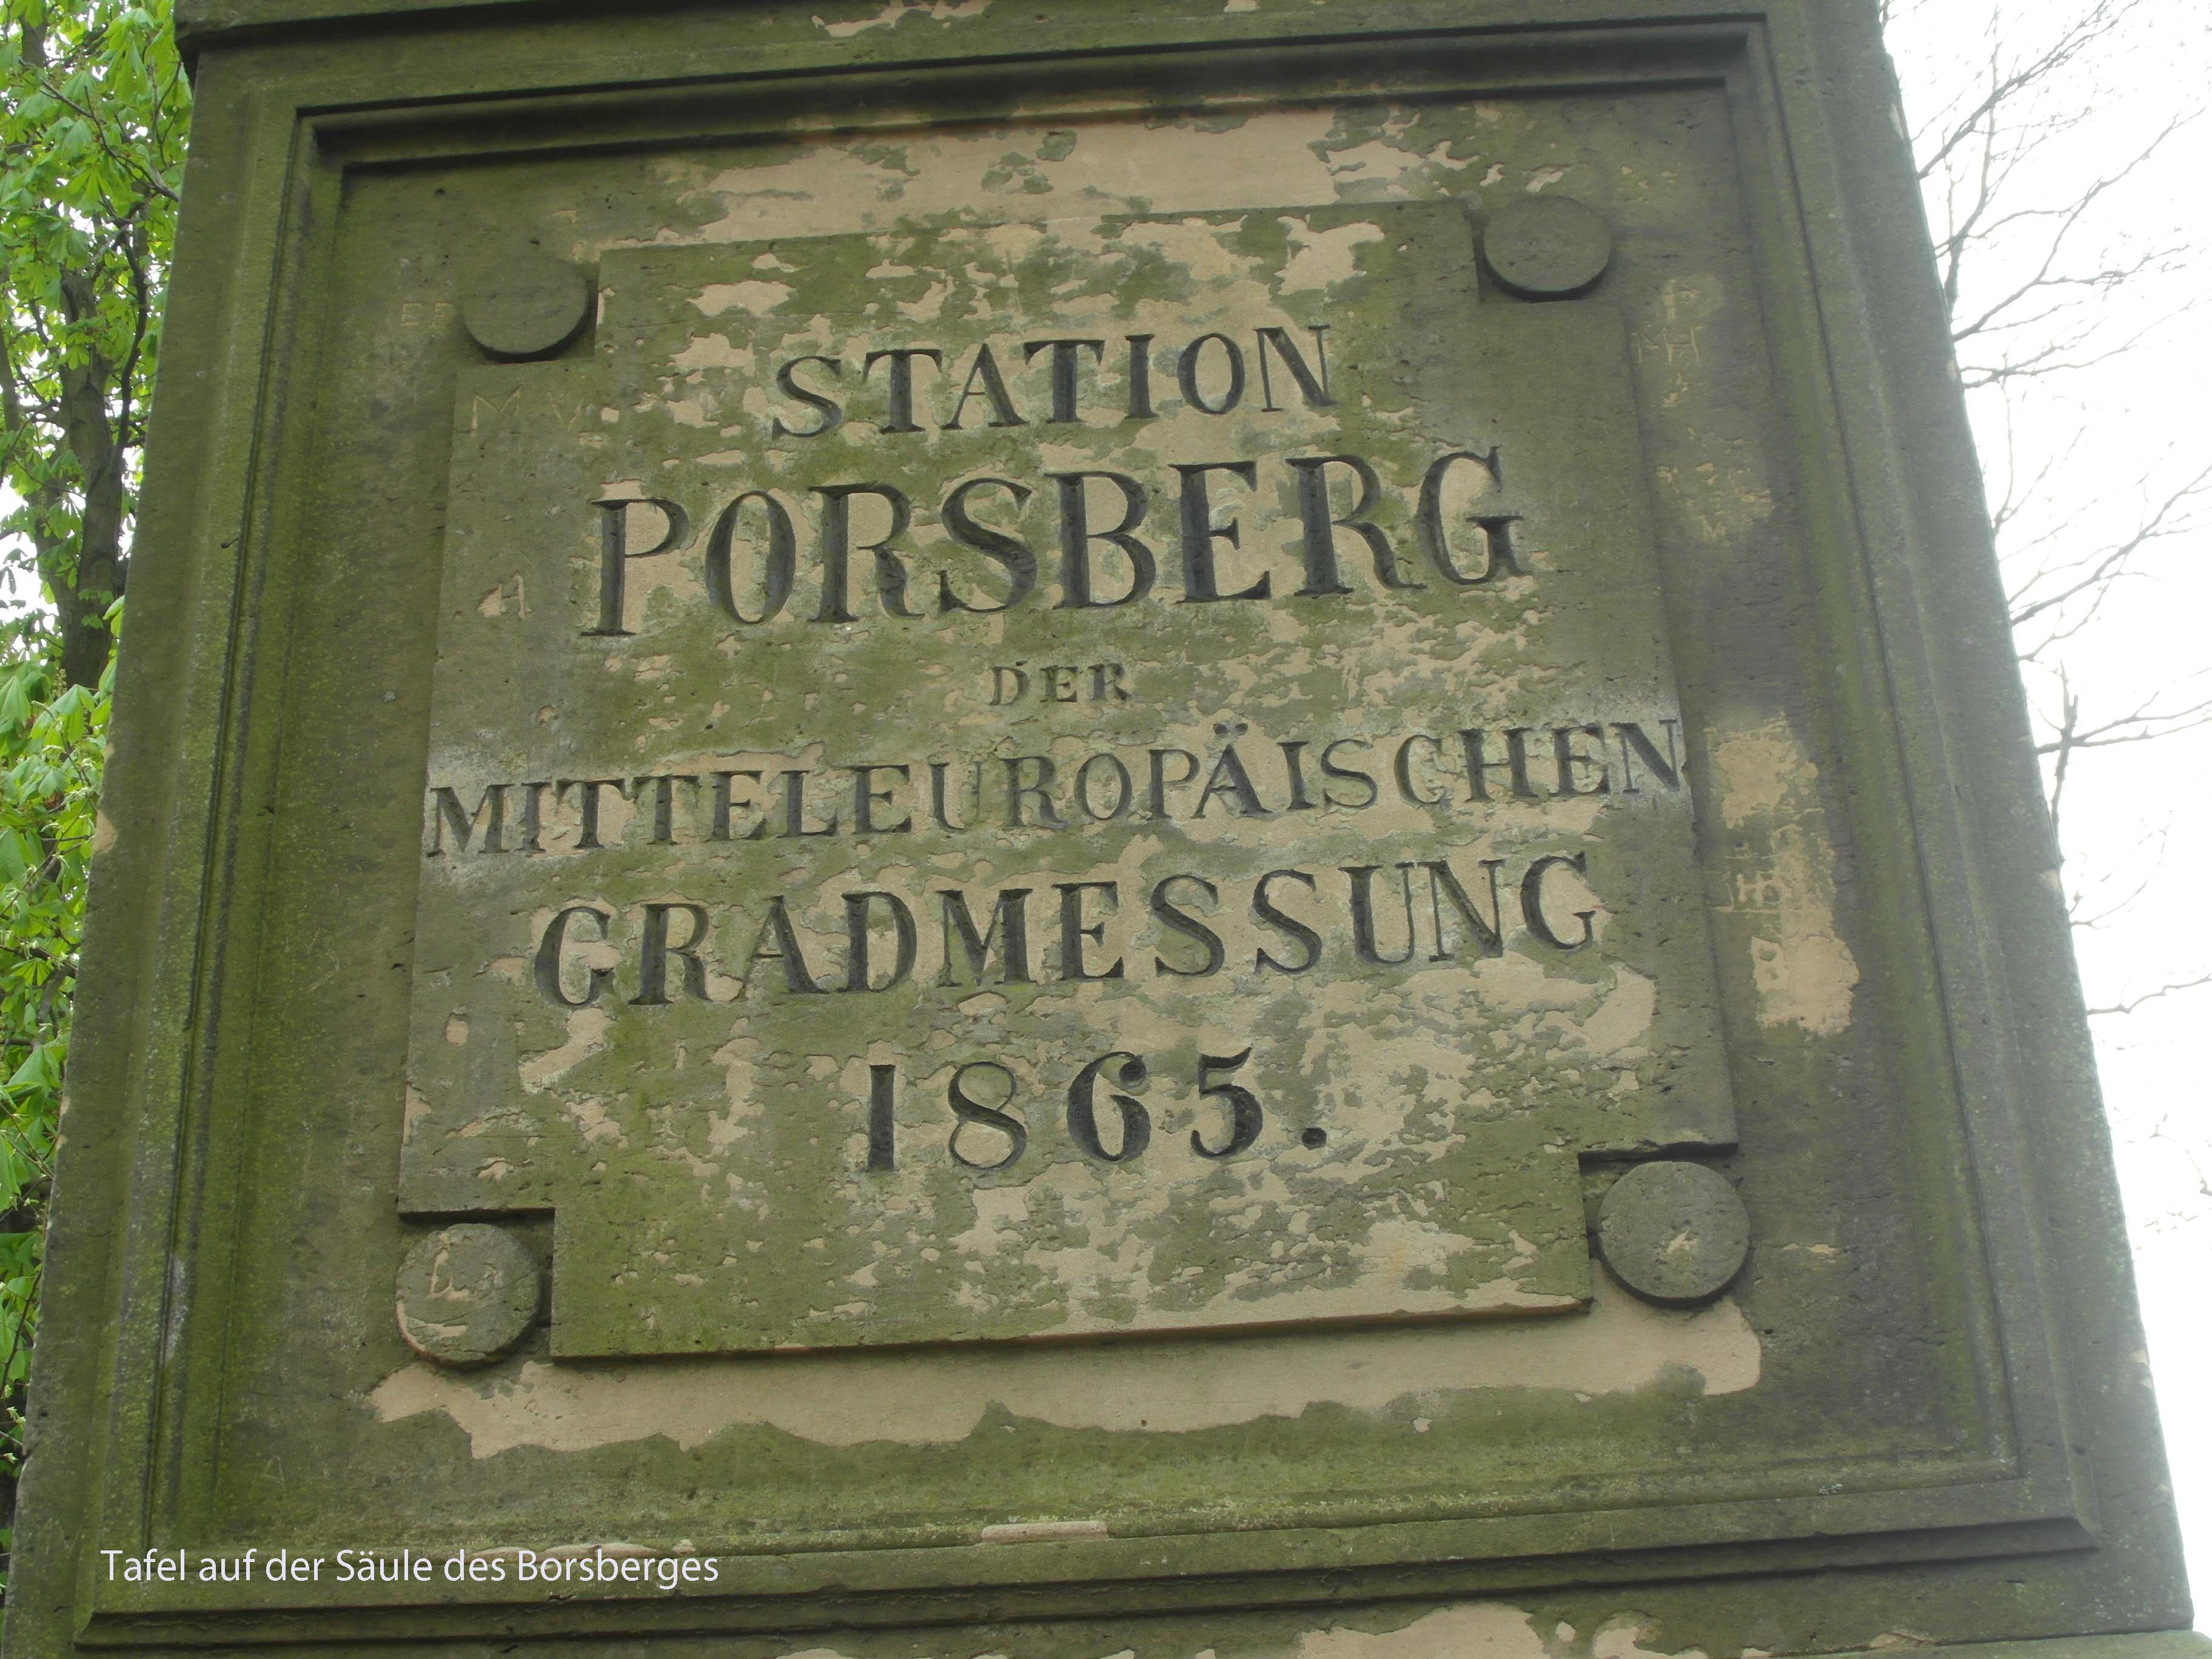 3 Tafel am Messpunkt Borsberg 2 Kopie